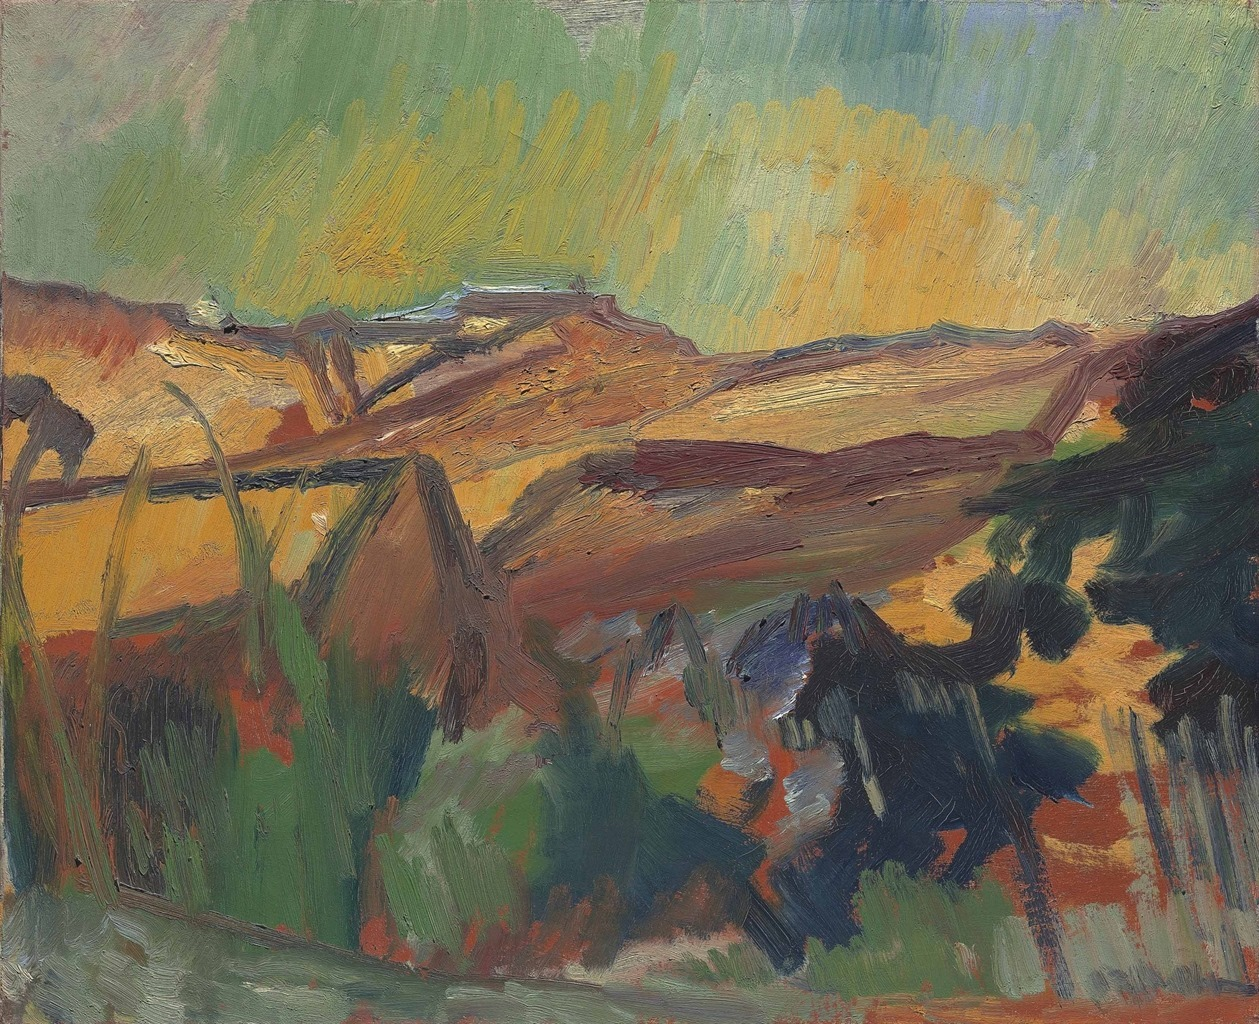 David Bomberg (1890-1957) Ronda Valley, Spain, 1954